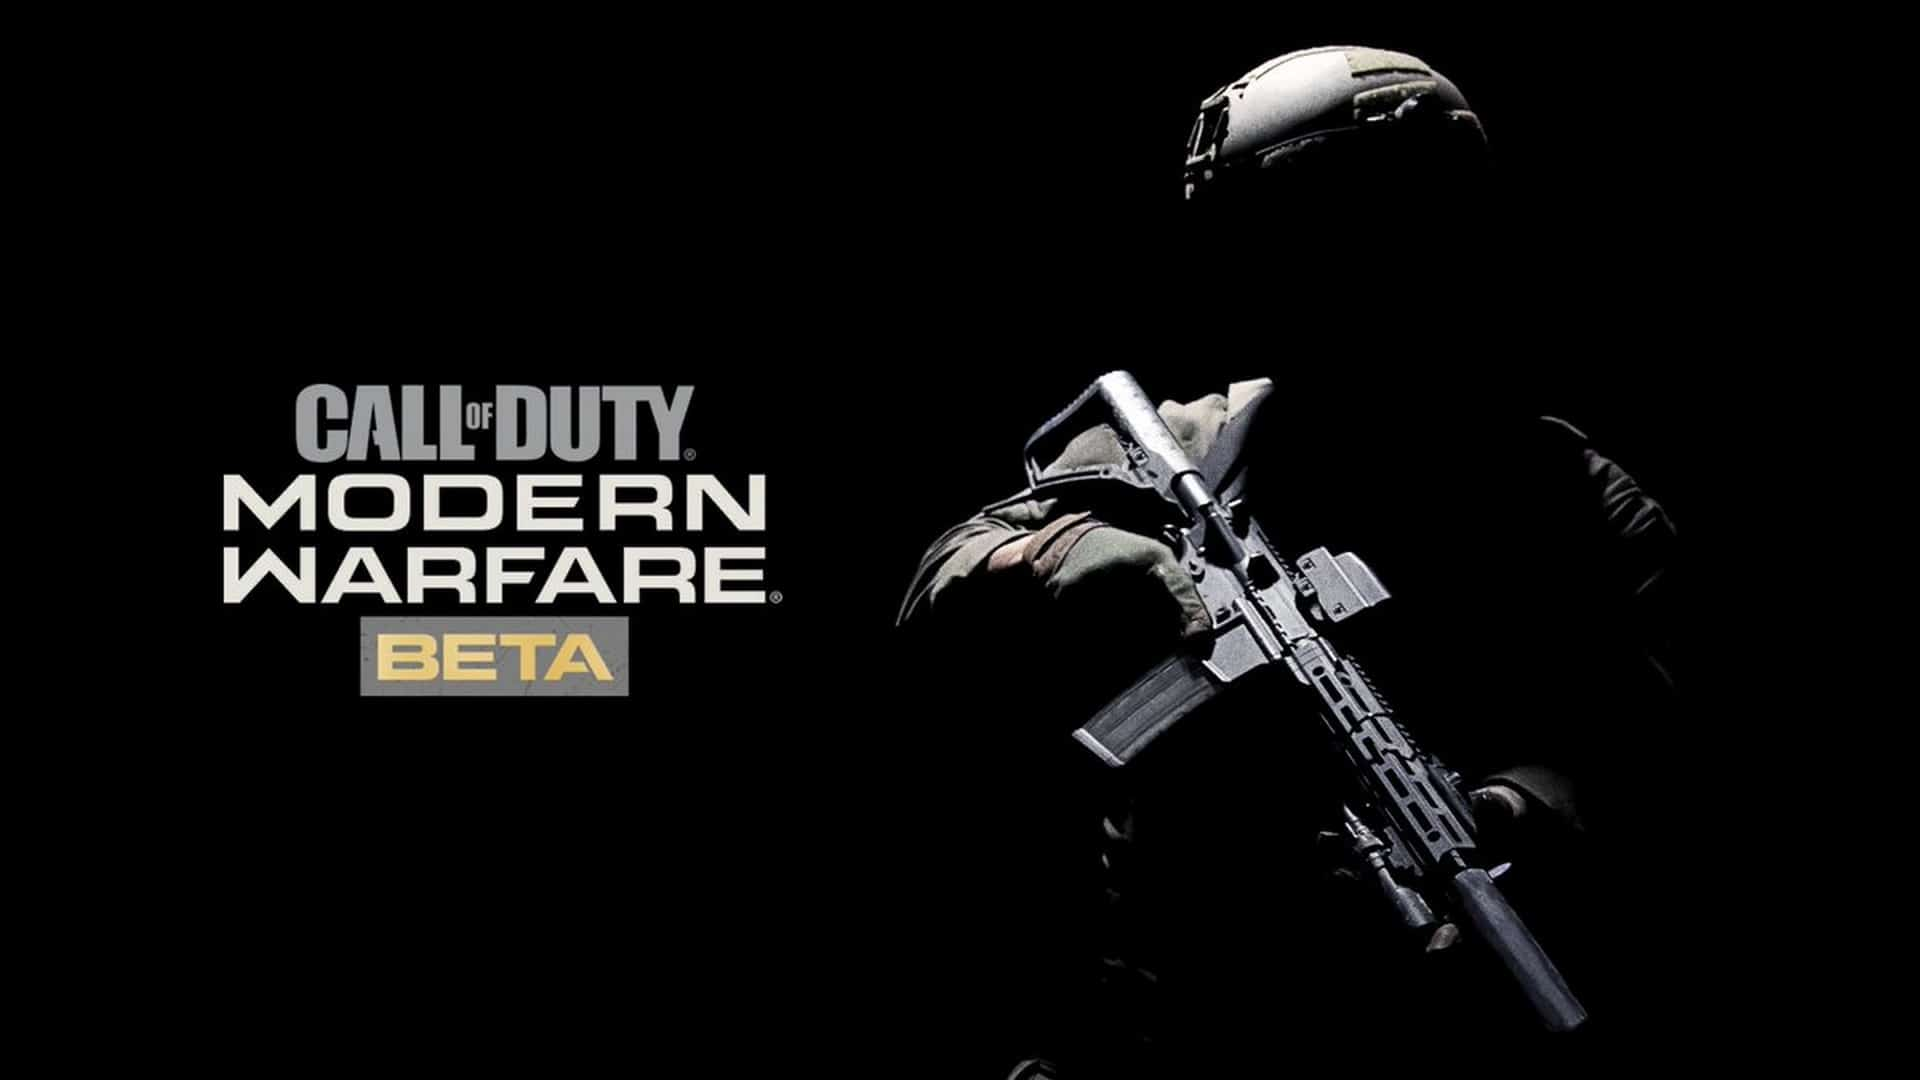 Call Of Duty: Modern Warfare Multiplayer BETA Starts Today